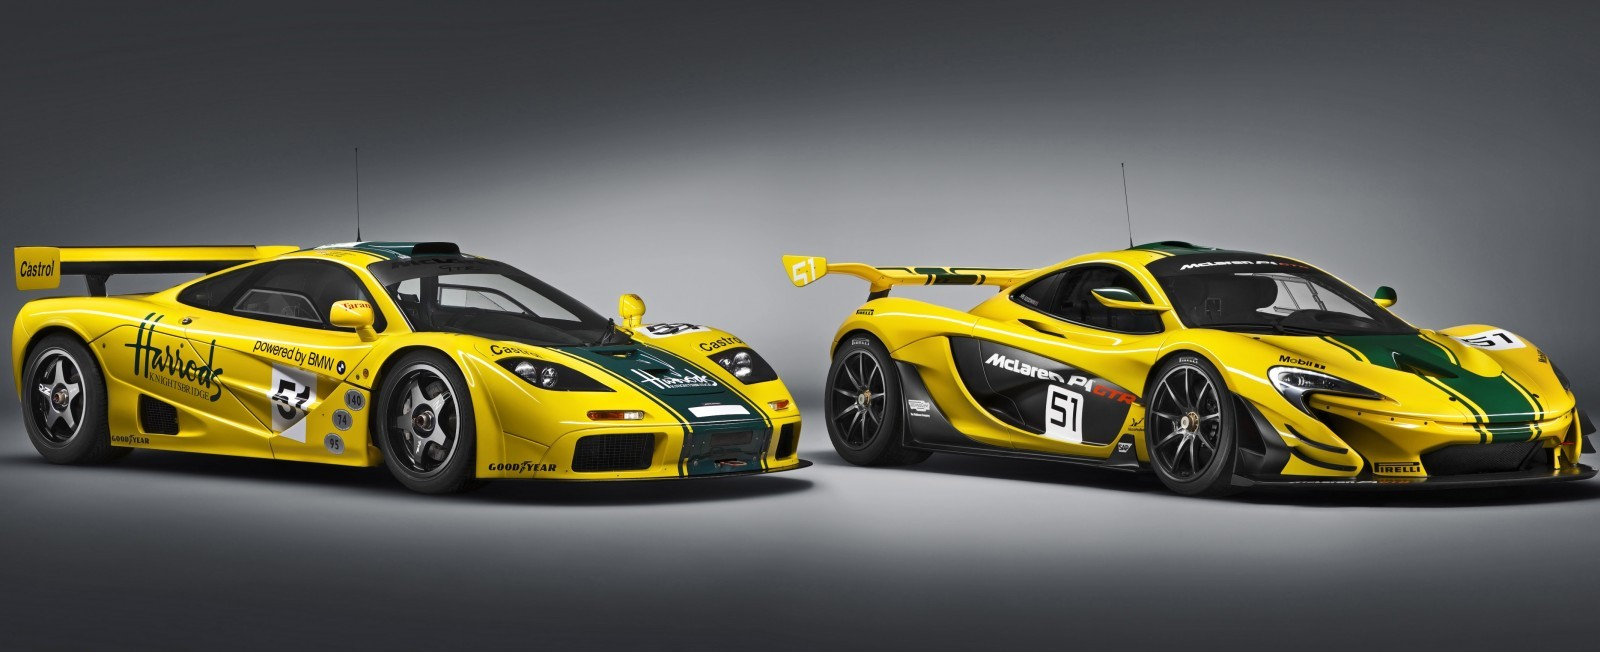 Geneva15_McLaren P1 GTR_11 copy